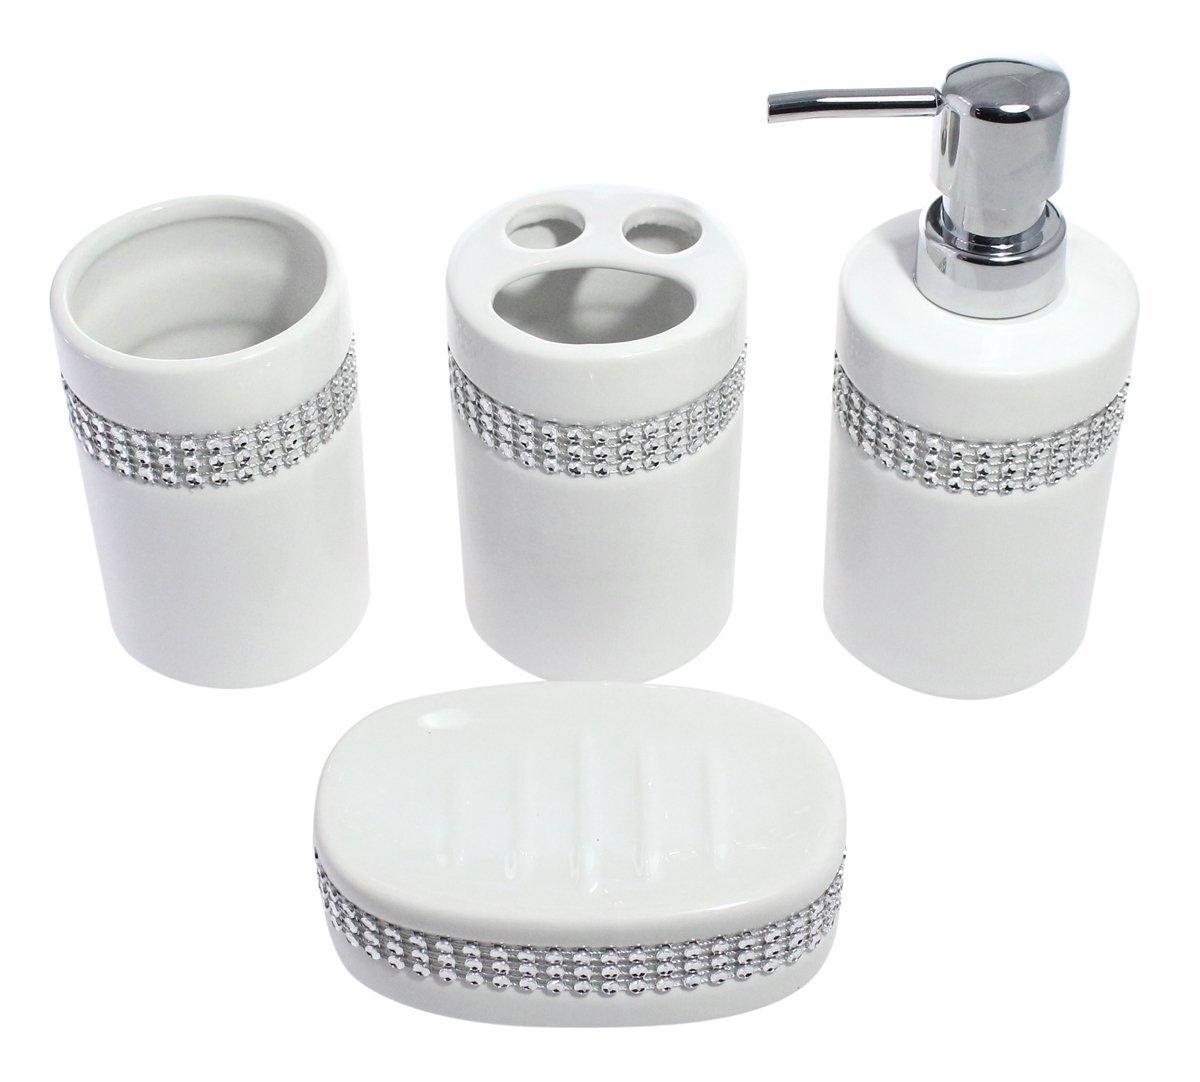 Amazon.com: 4 Piece White Ceramic Complete Bathroom Accessory Set ...